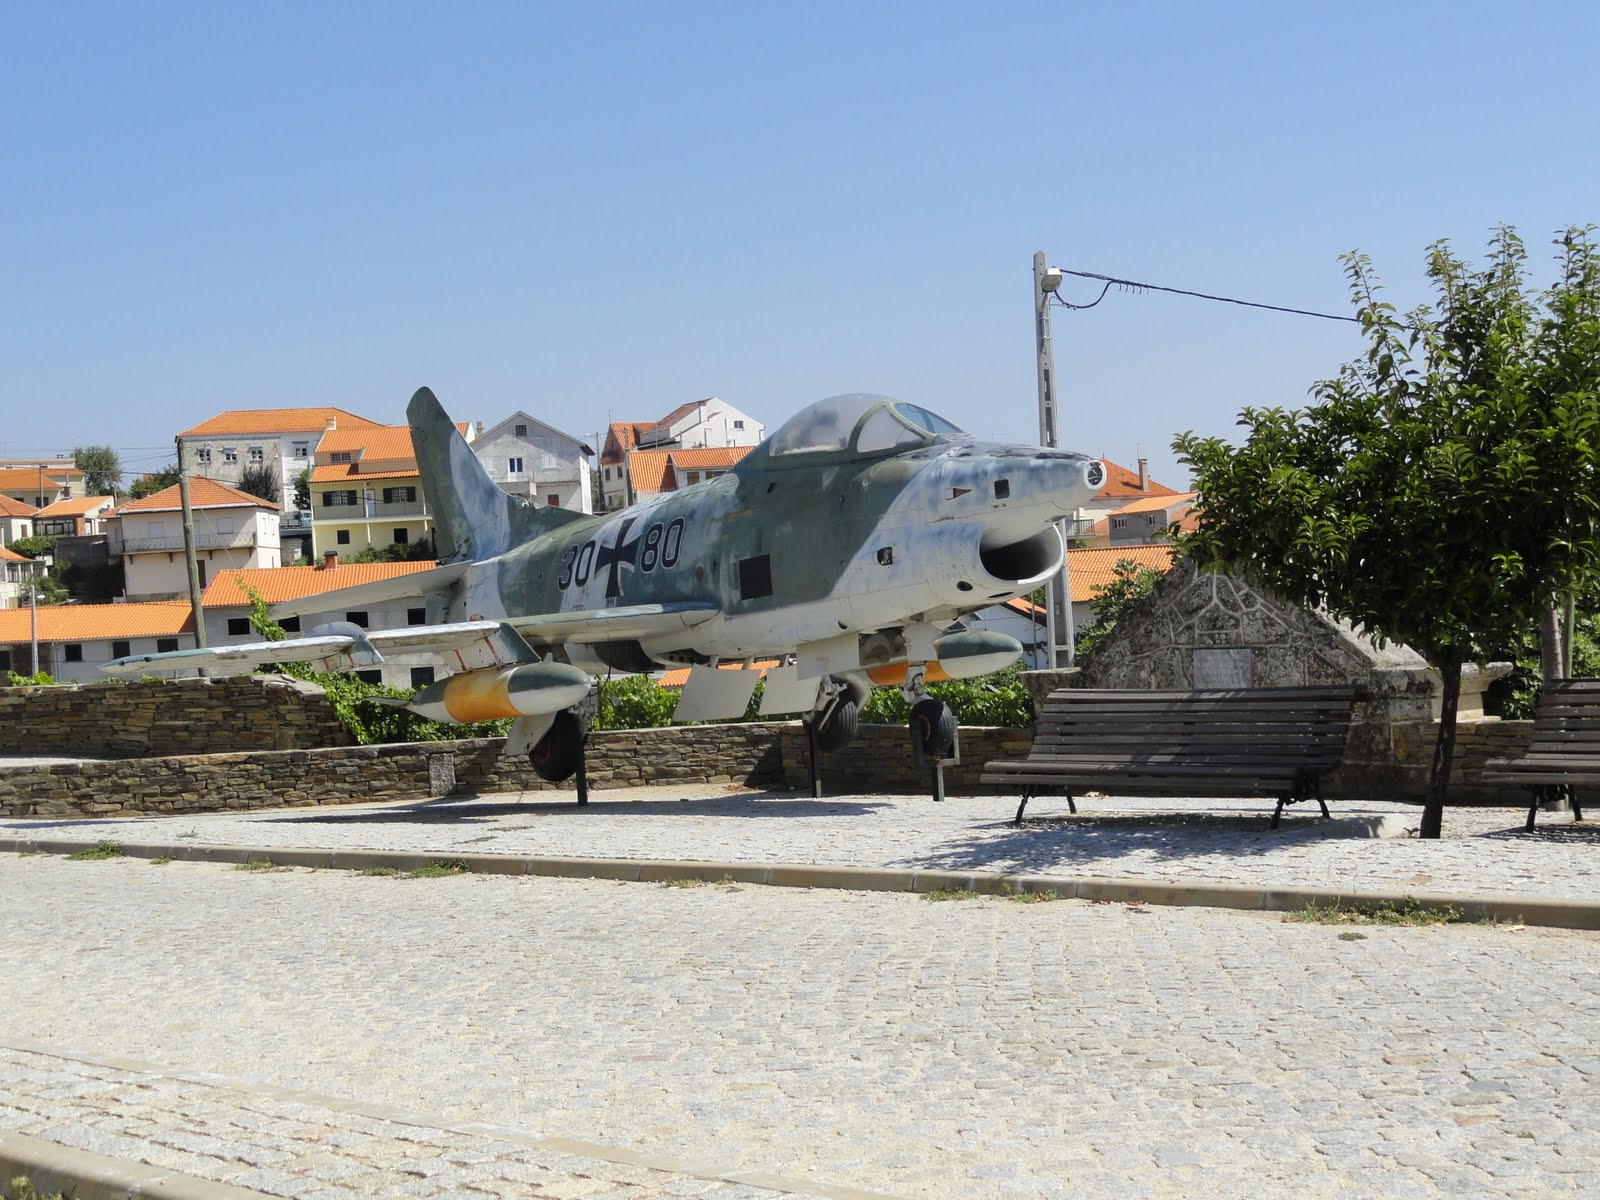 Naam: Fiat G.91 - Horta do Douro, Portugal..JPG Bekeken: 136 Grootte: 312,2 KB